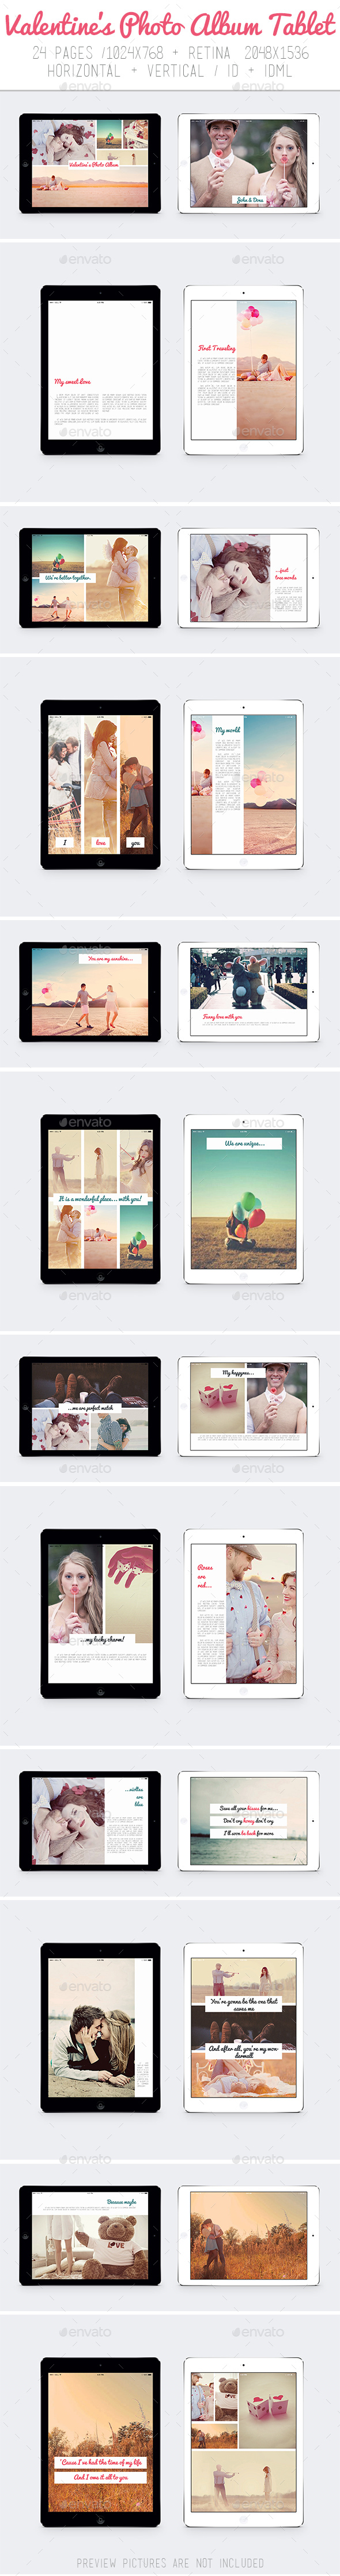 Ipad&Tablet Valentines Photo Album - Digital Magazines ePublishing